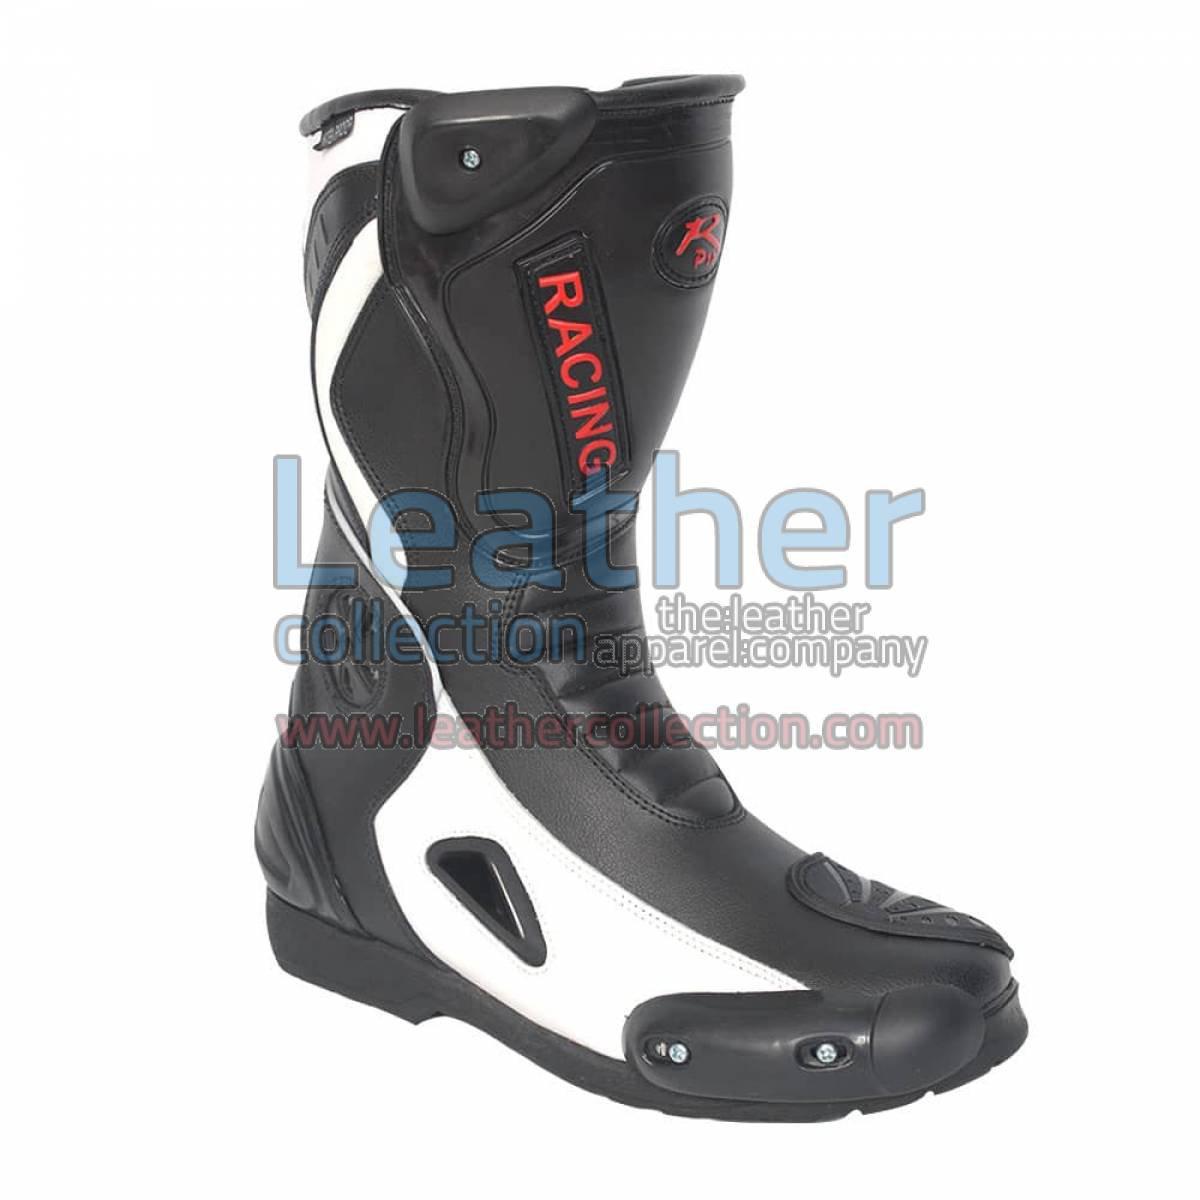 Phantom Motorcycle Rider Boots